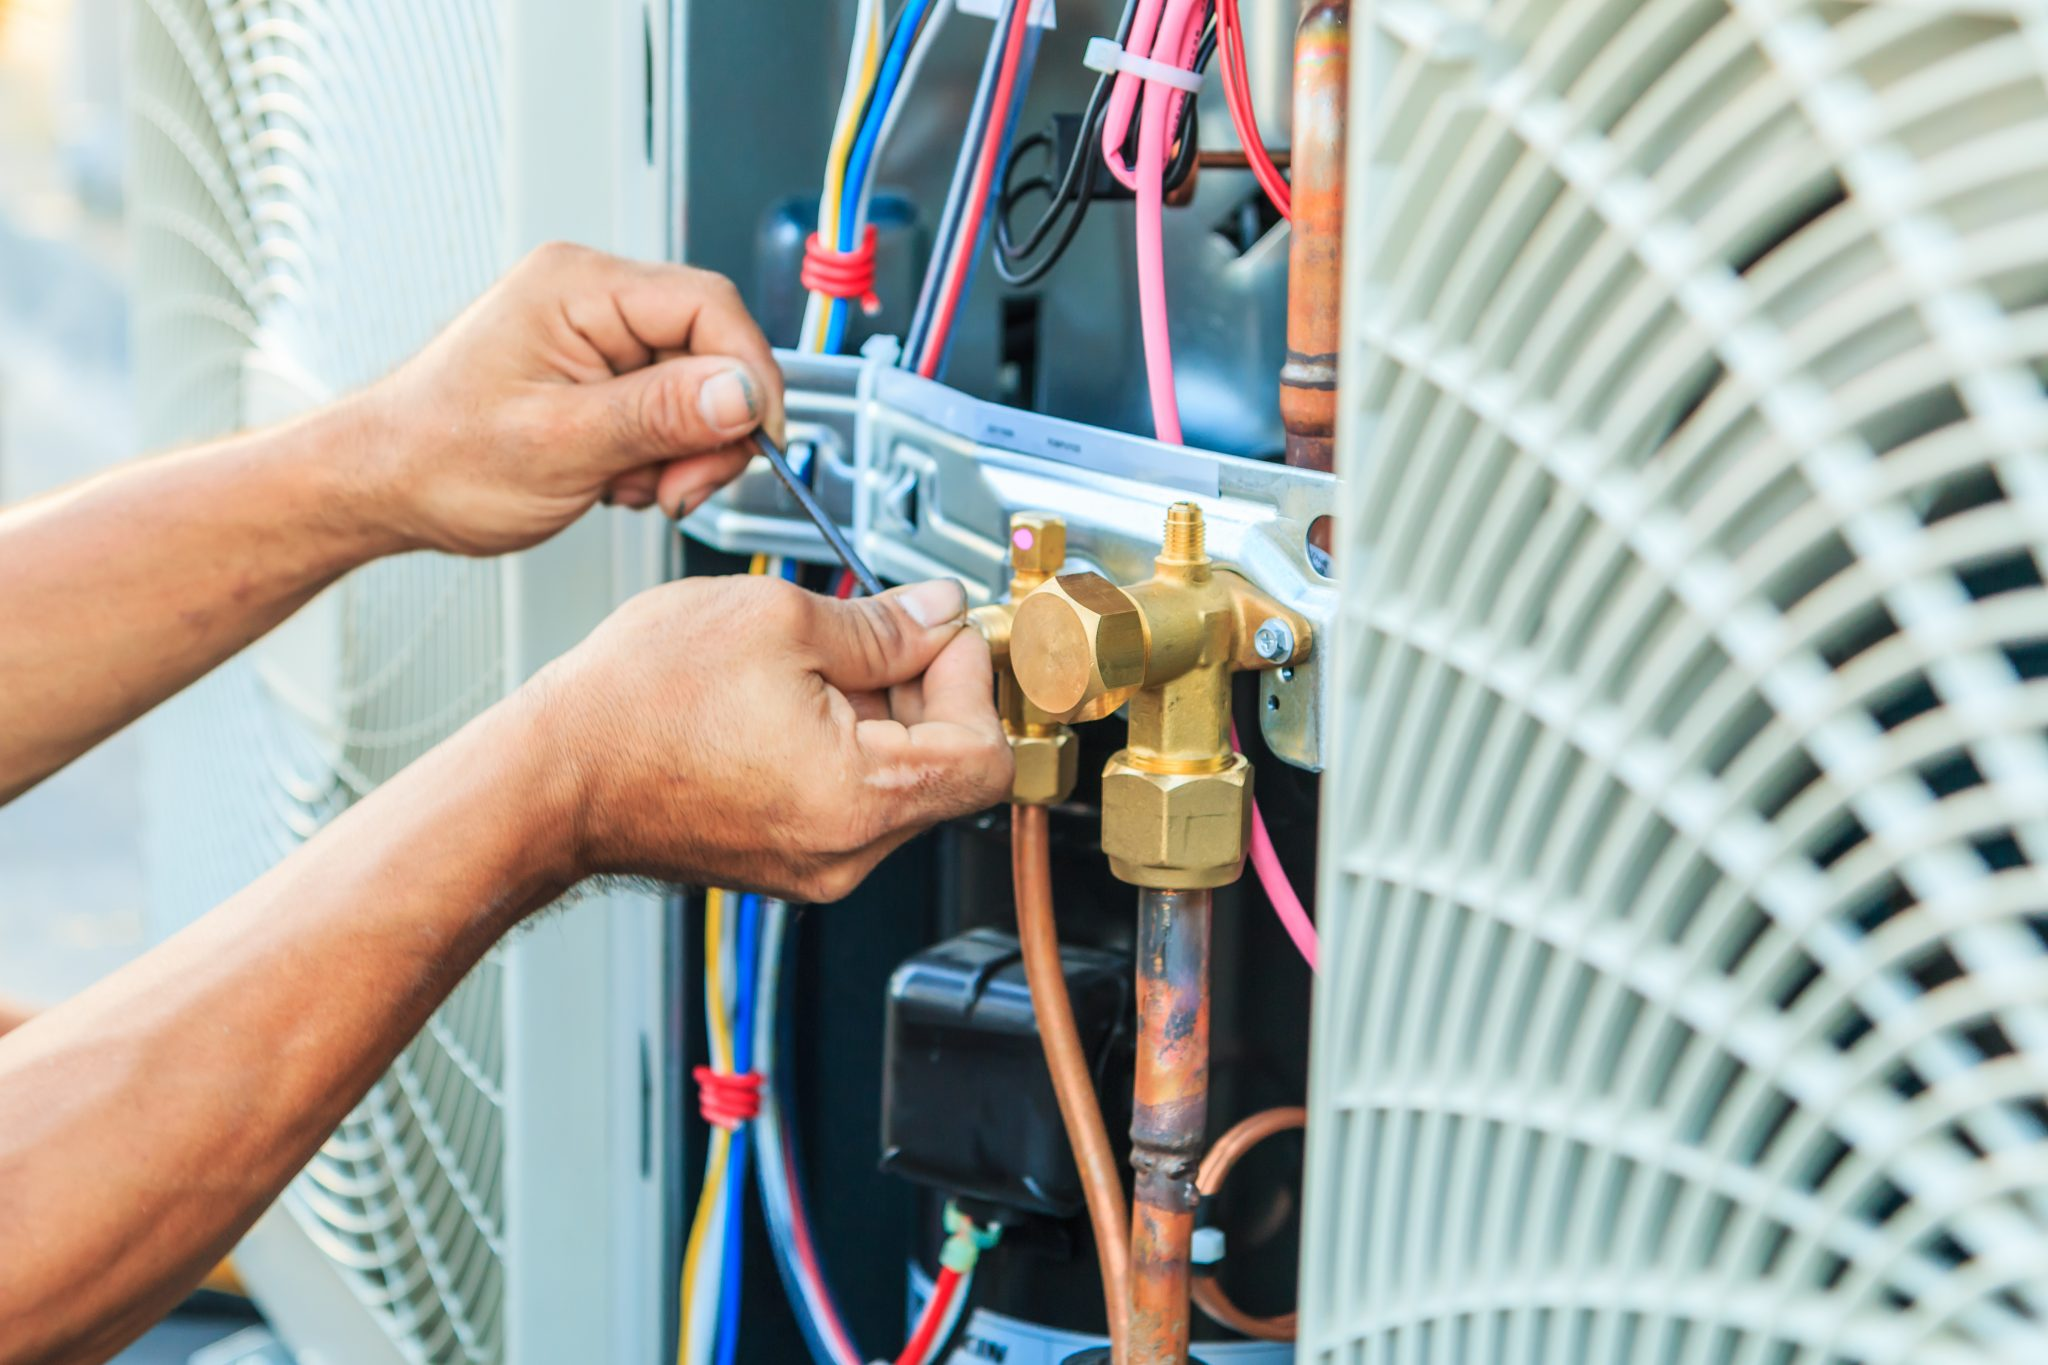 Klimaanlage Wohnraumlüftung Installation